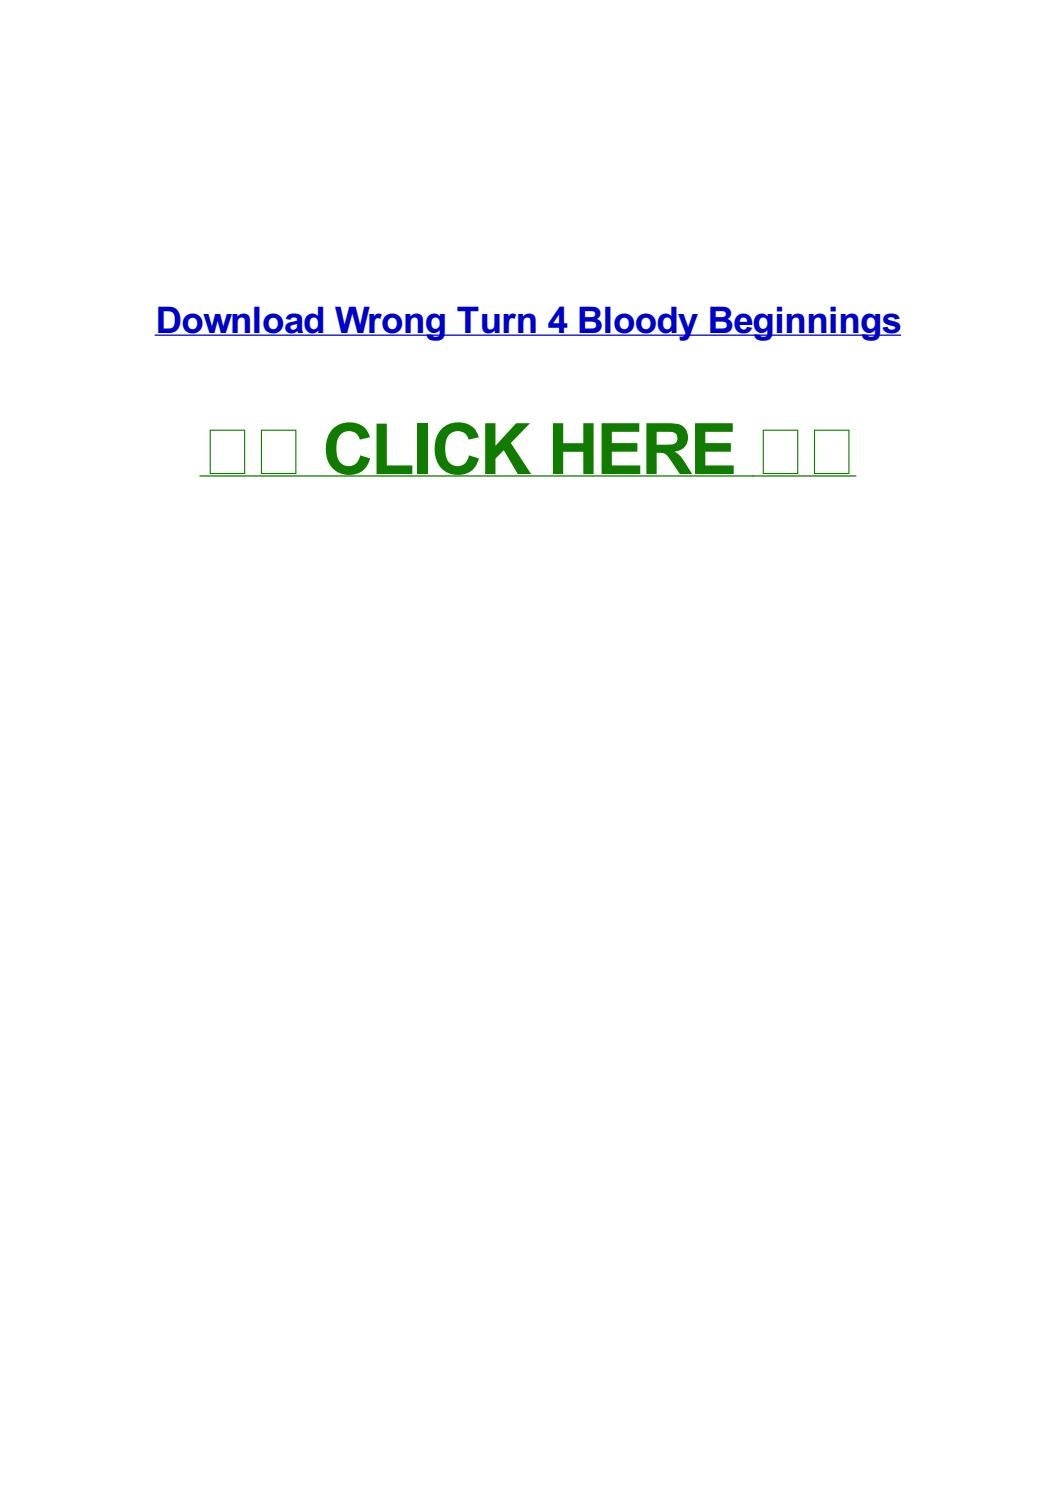 Wrong turn 4 bloody beginnings by normapsevz - issuu